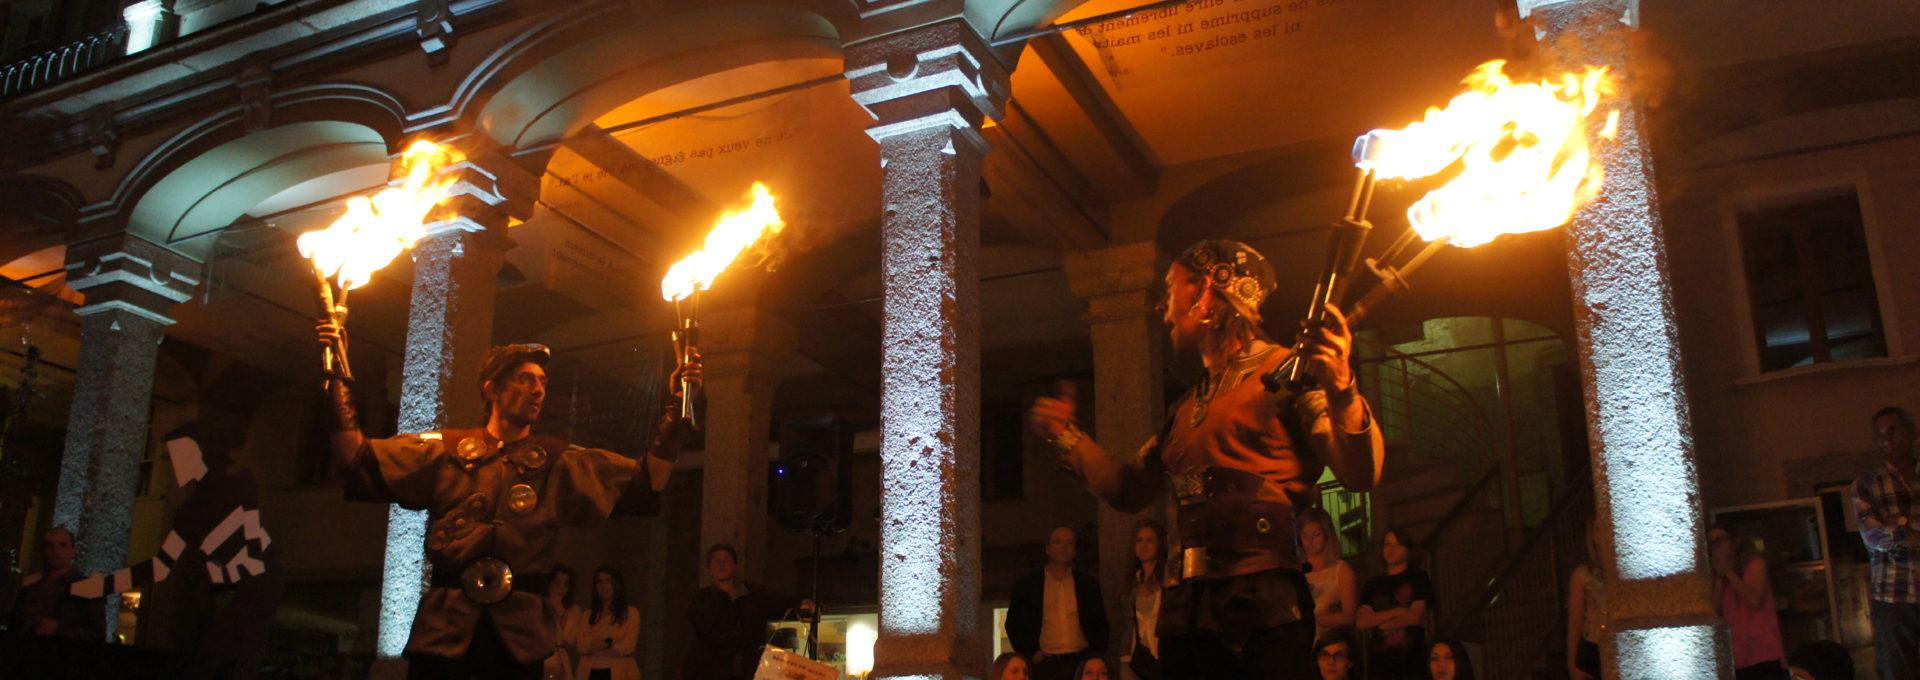 Festival Art de Rue de Sion